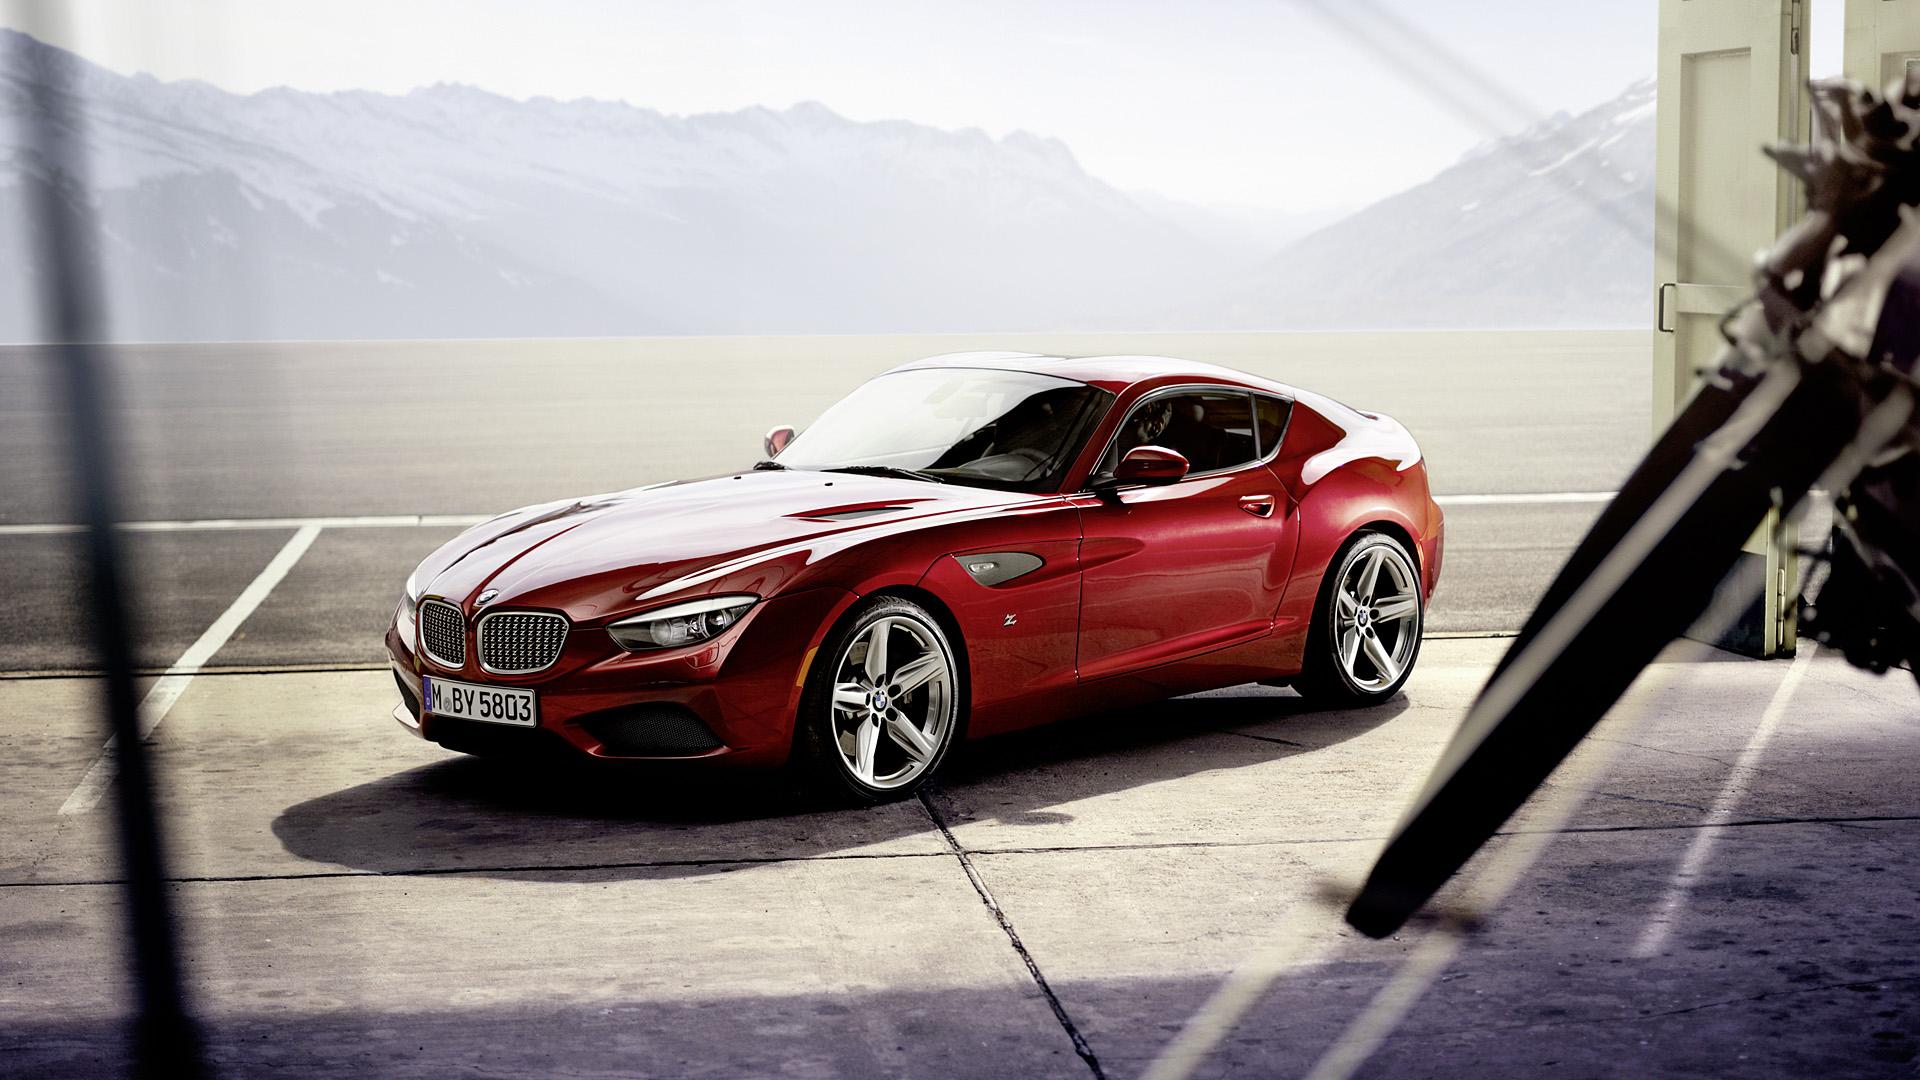 Cool BMW Zagato Wallpaper